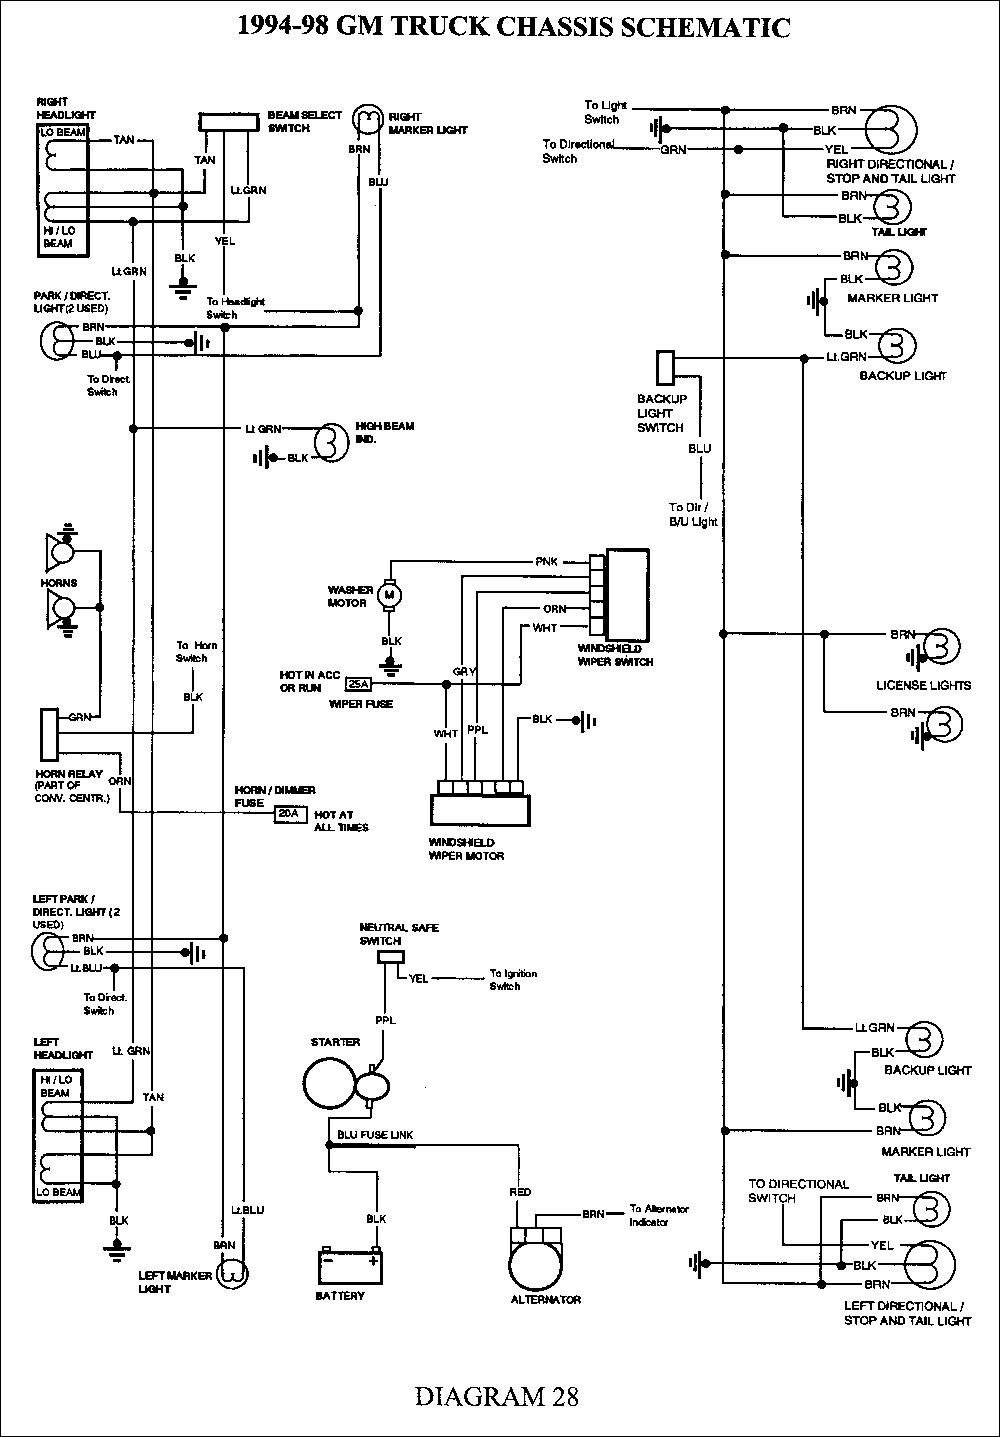 7 Round Trailer Wiring Diagram 2005 Chevy Express Electrical Saturn Outlook Tail Light Viewdulah Co Silverado Pin